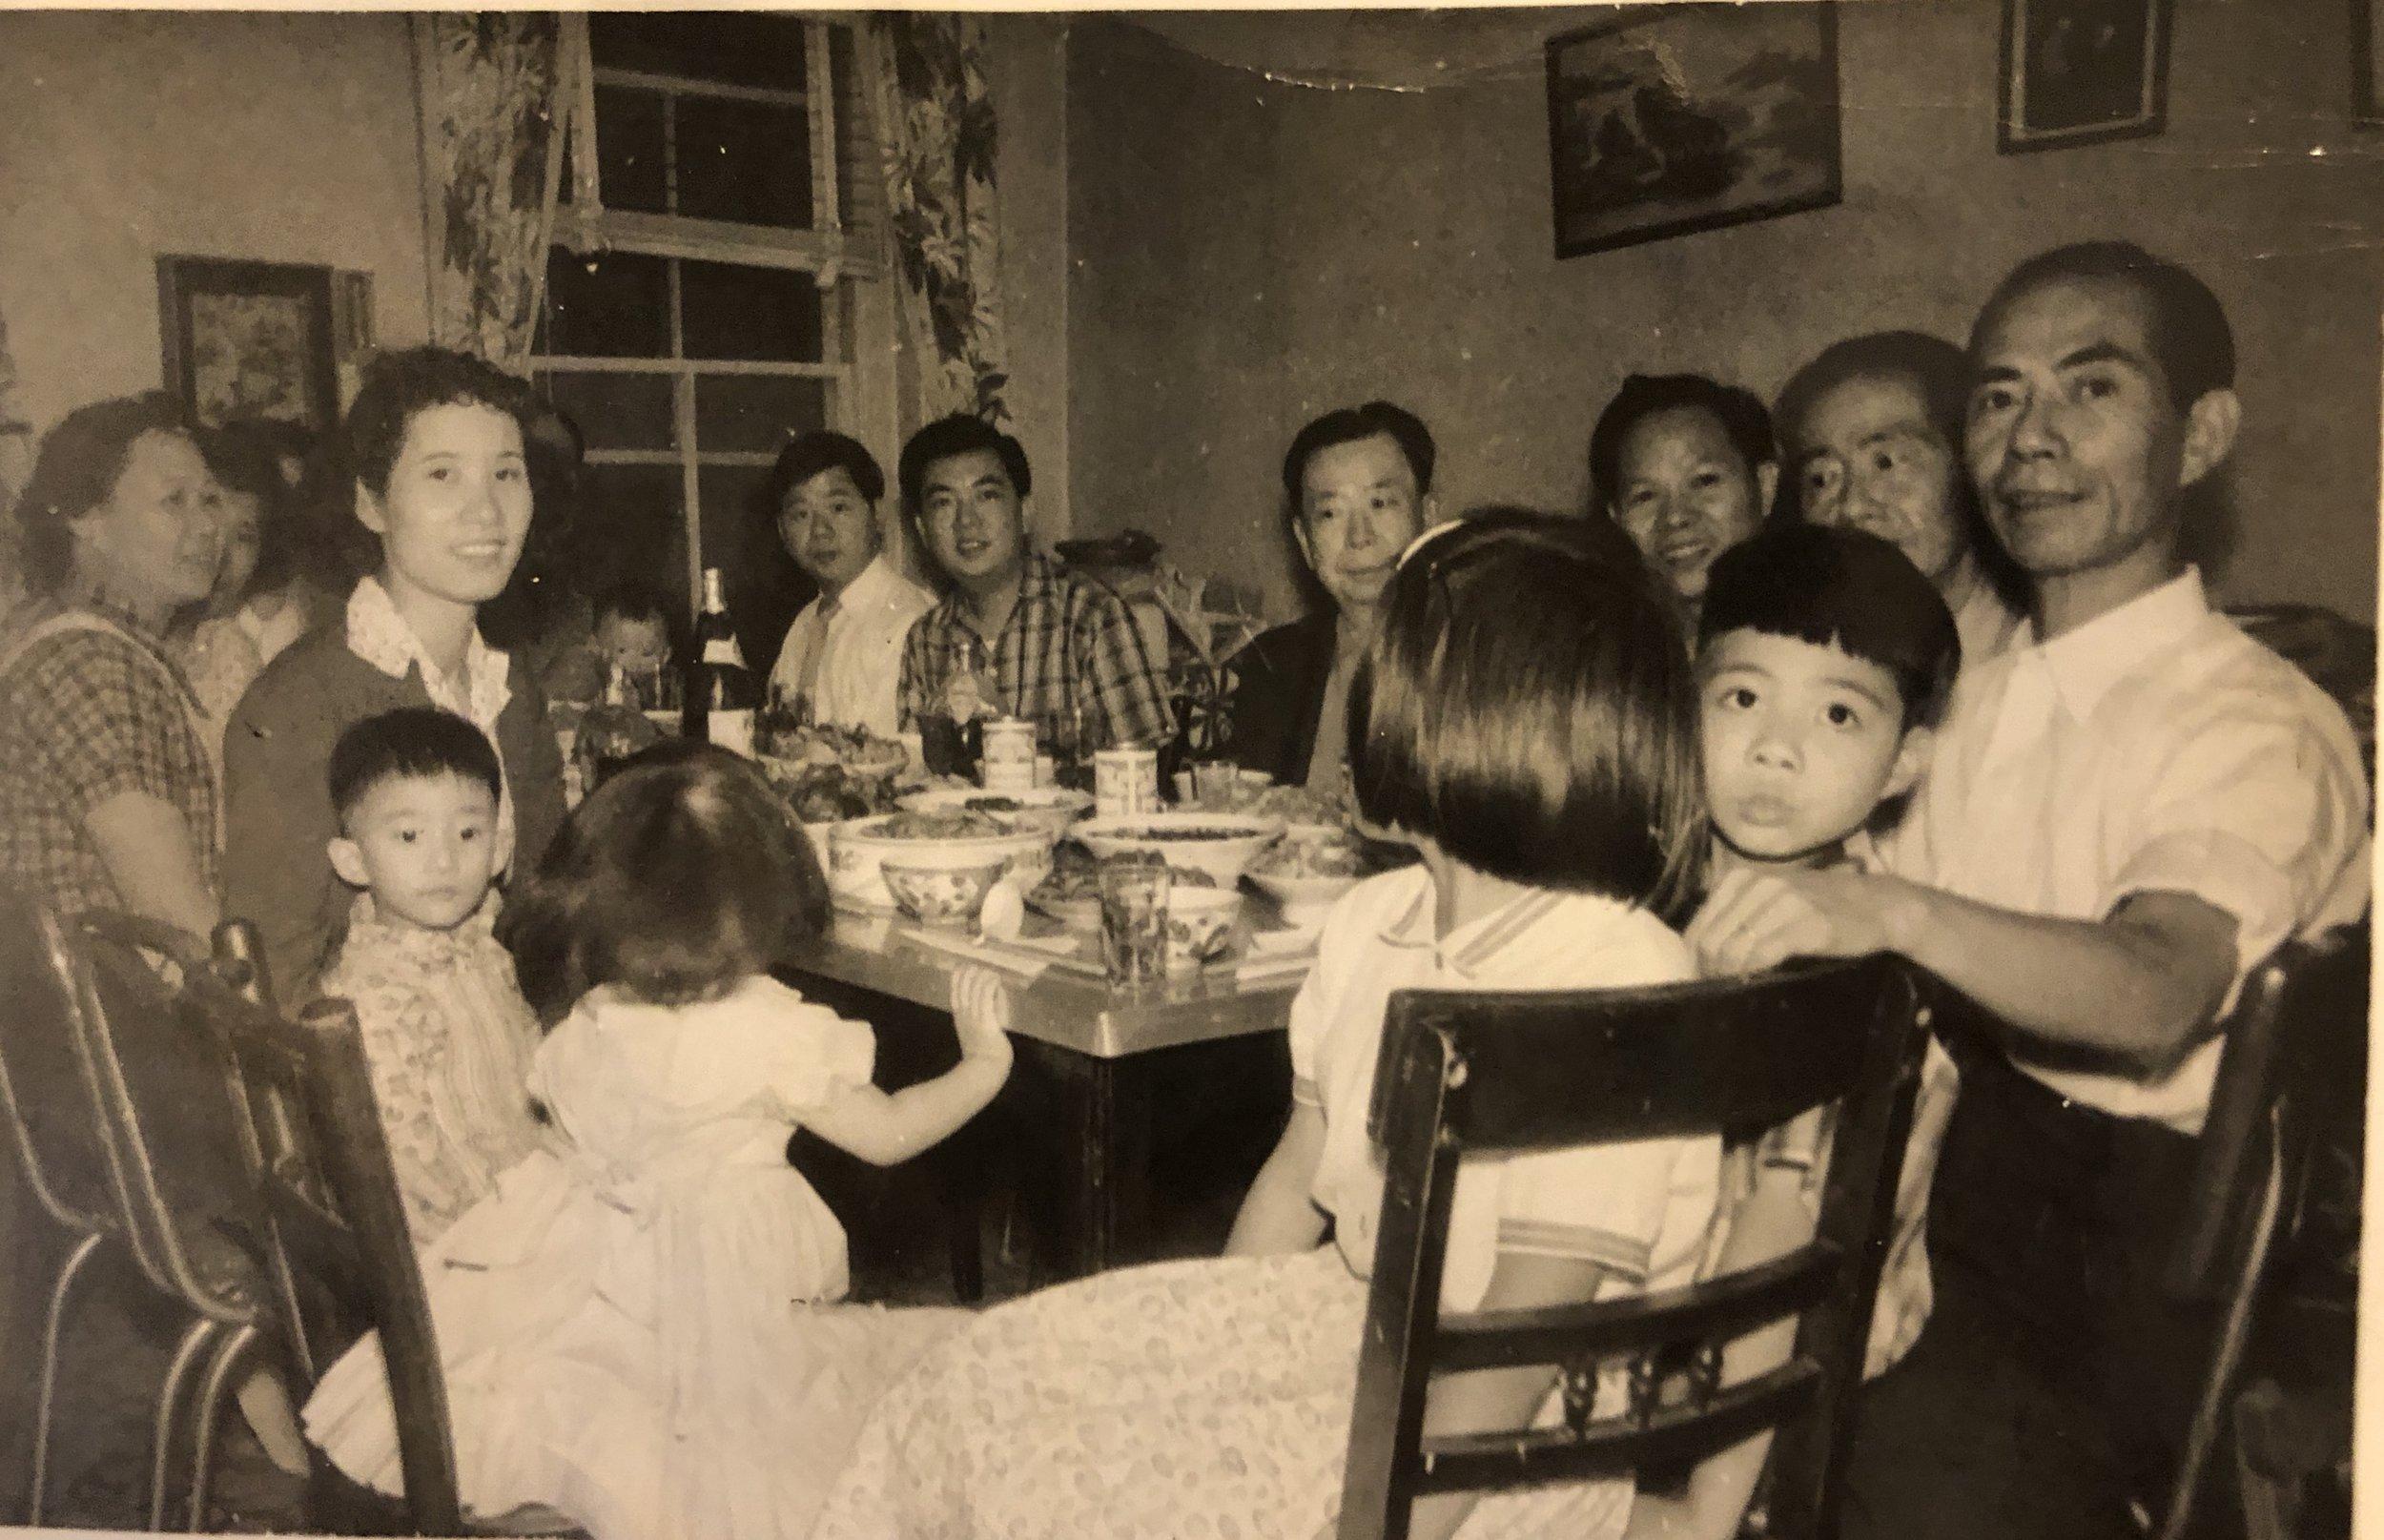 The Yee Family having a celebration dinner at their home on Hudson Street.